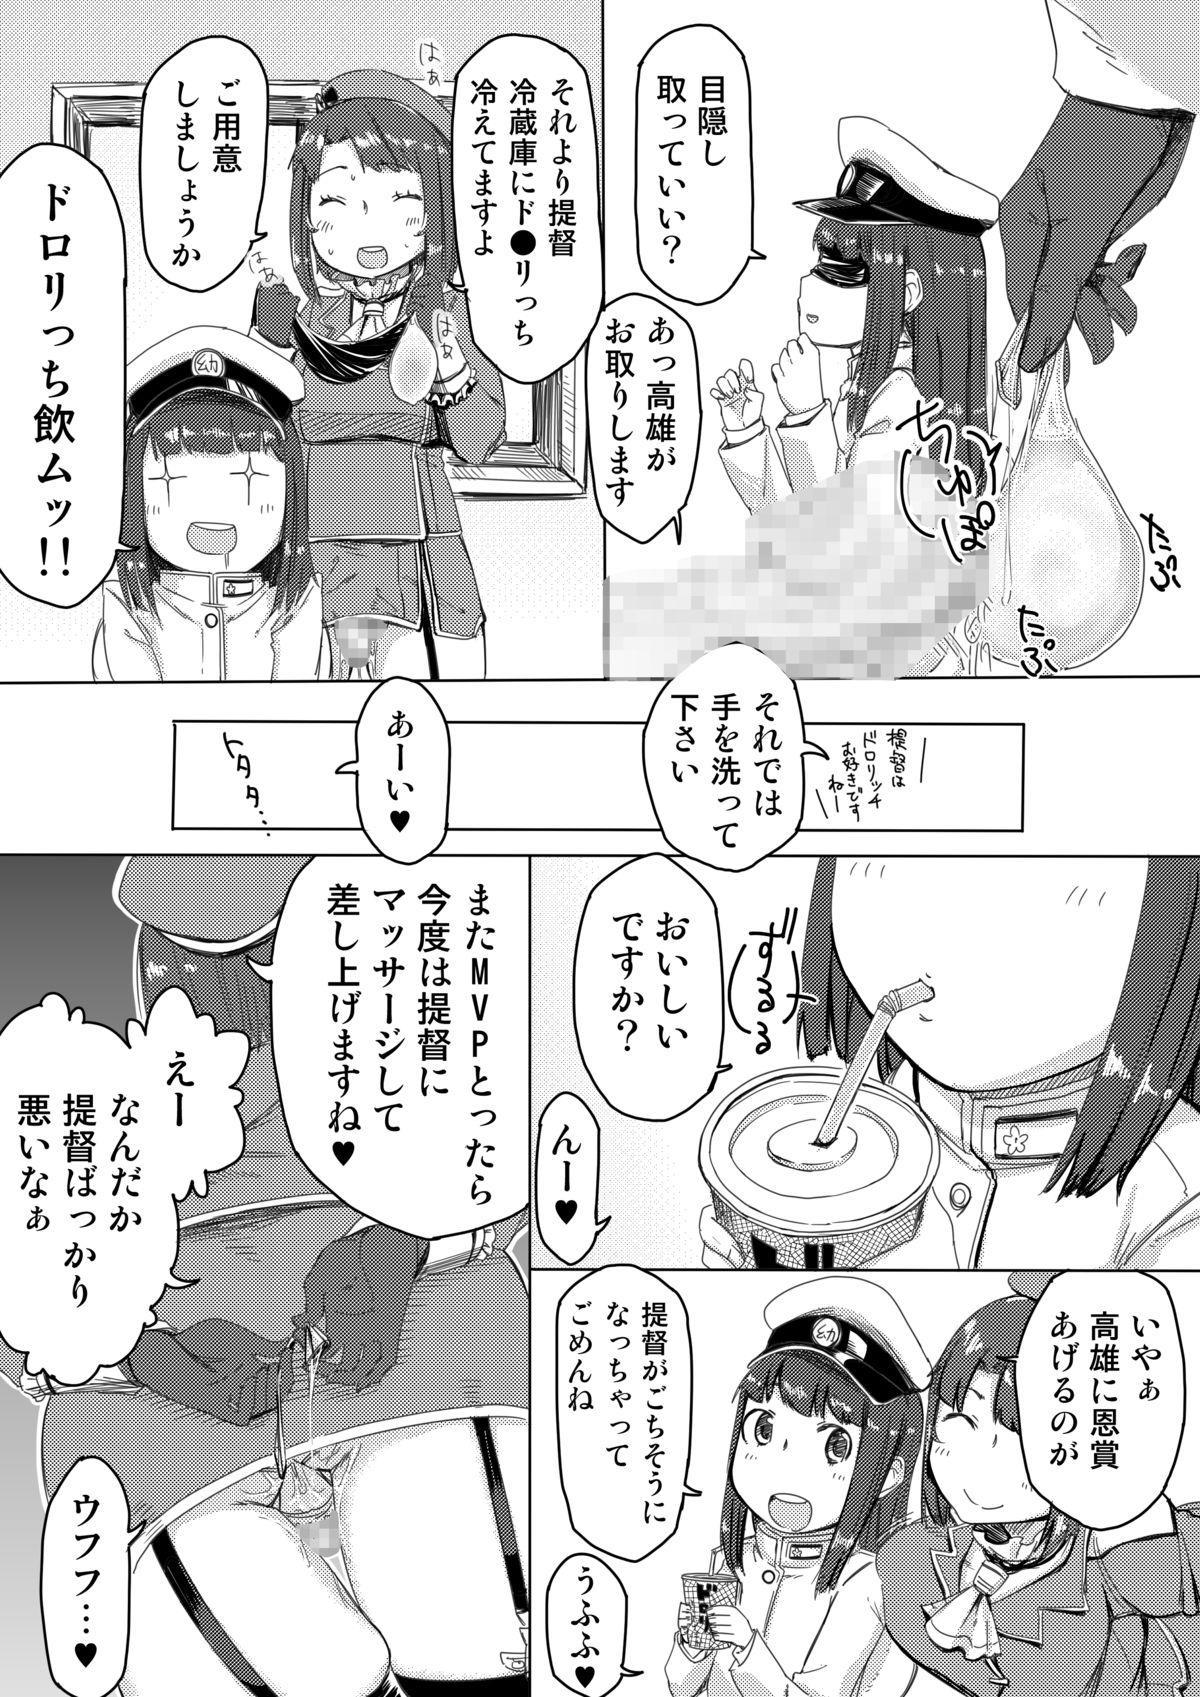 Teitoku to Takao-san Milk 8